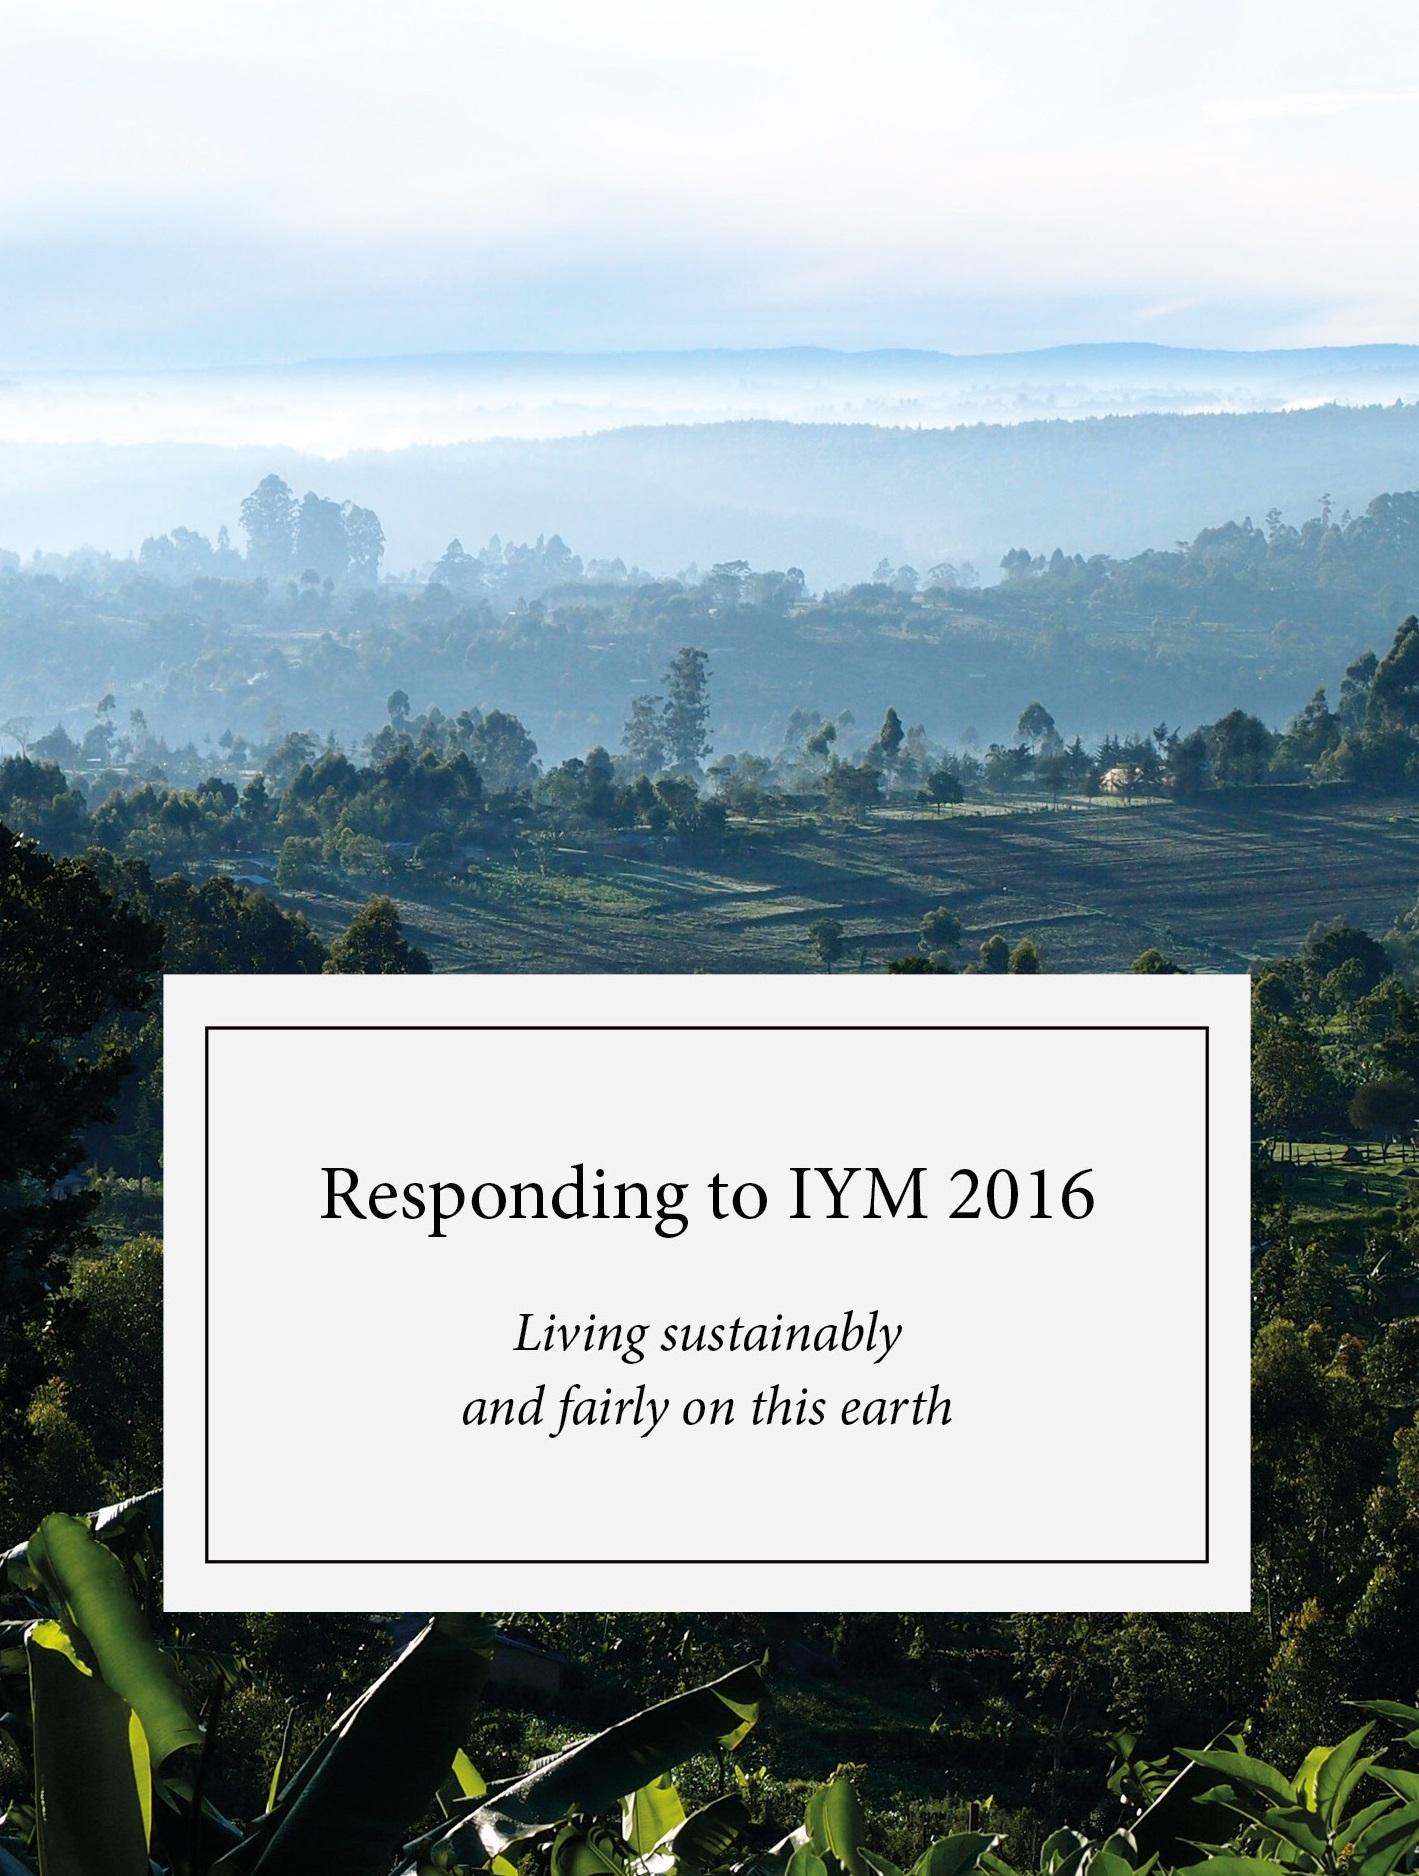 Responding to IYM 2016